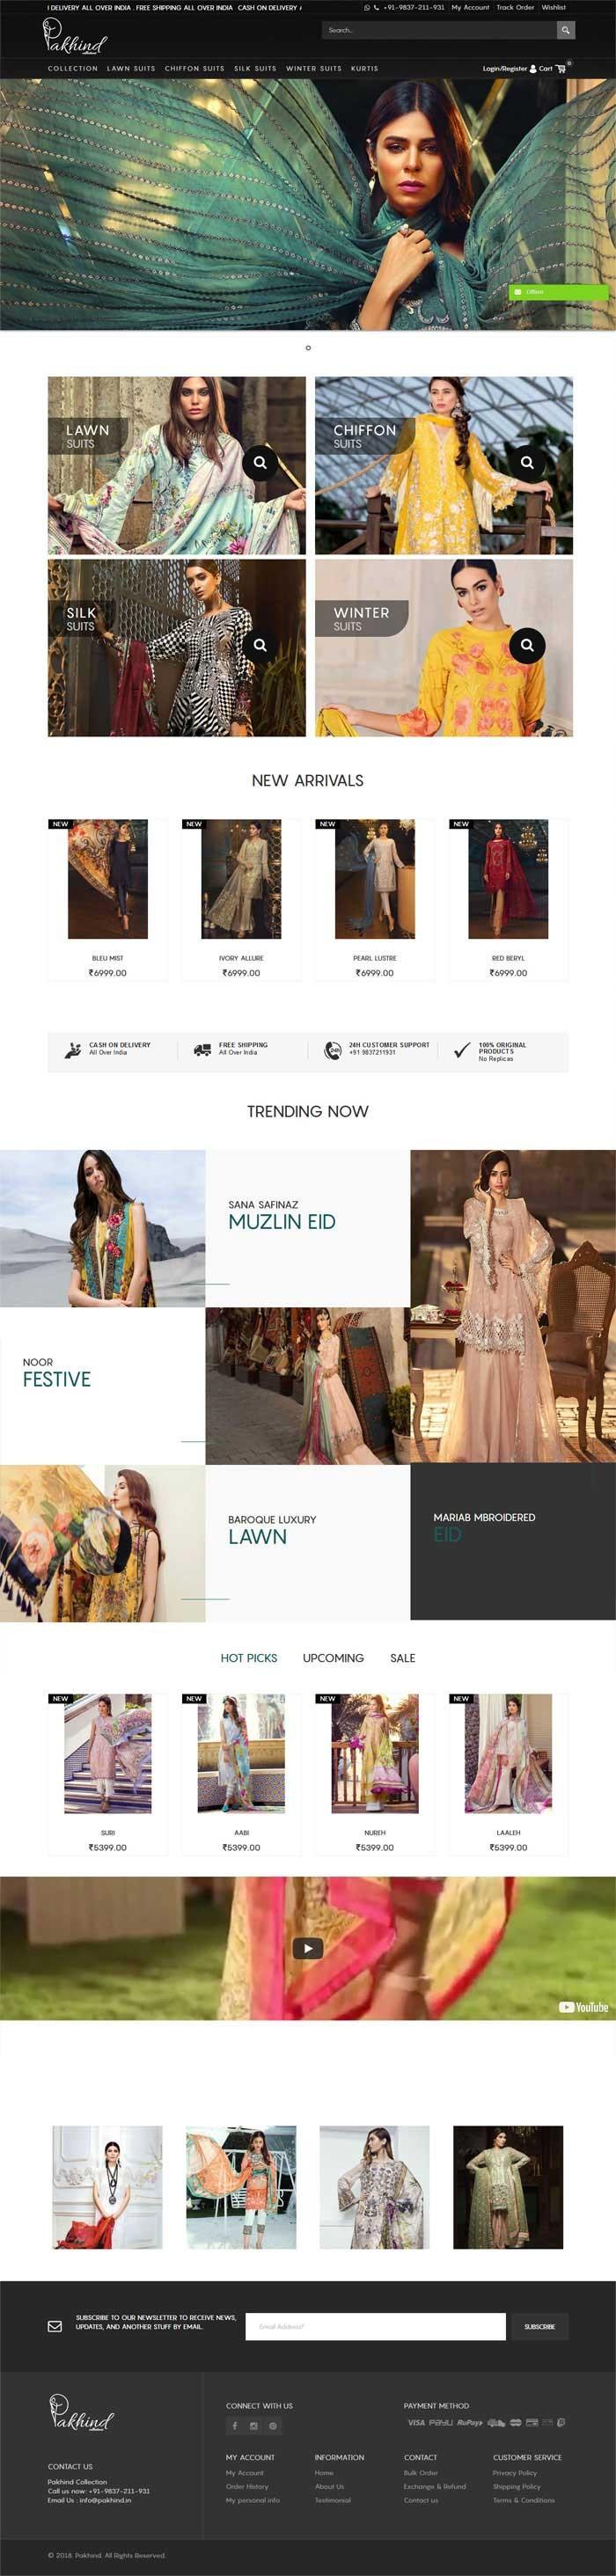 PakHind - Pakistani Suites Collection